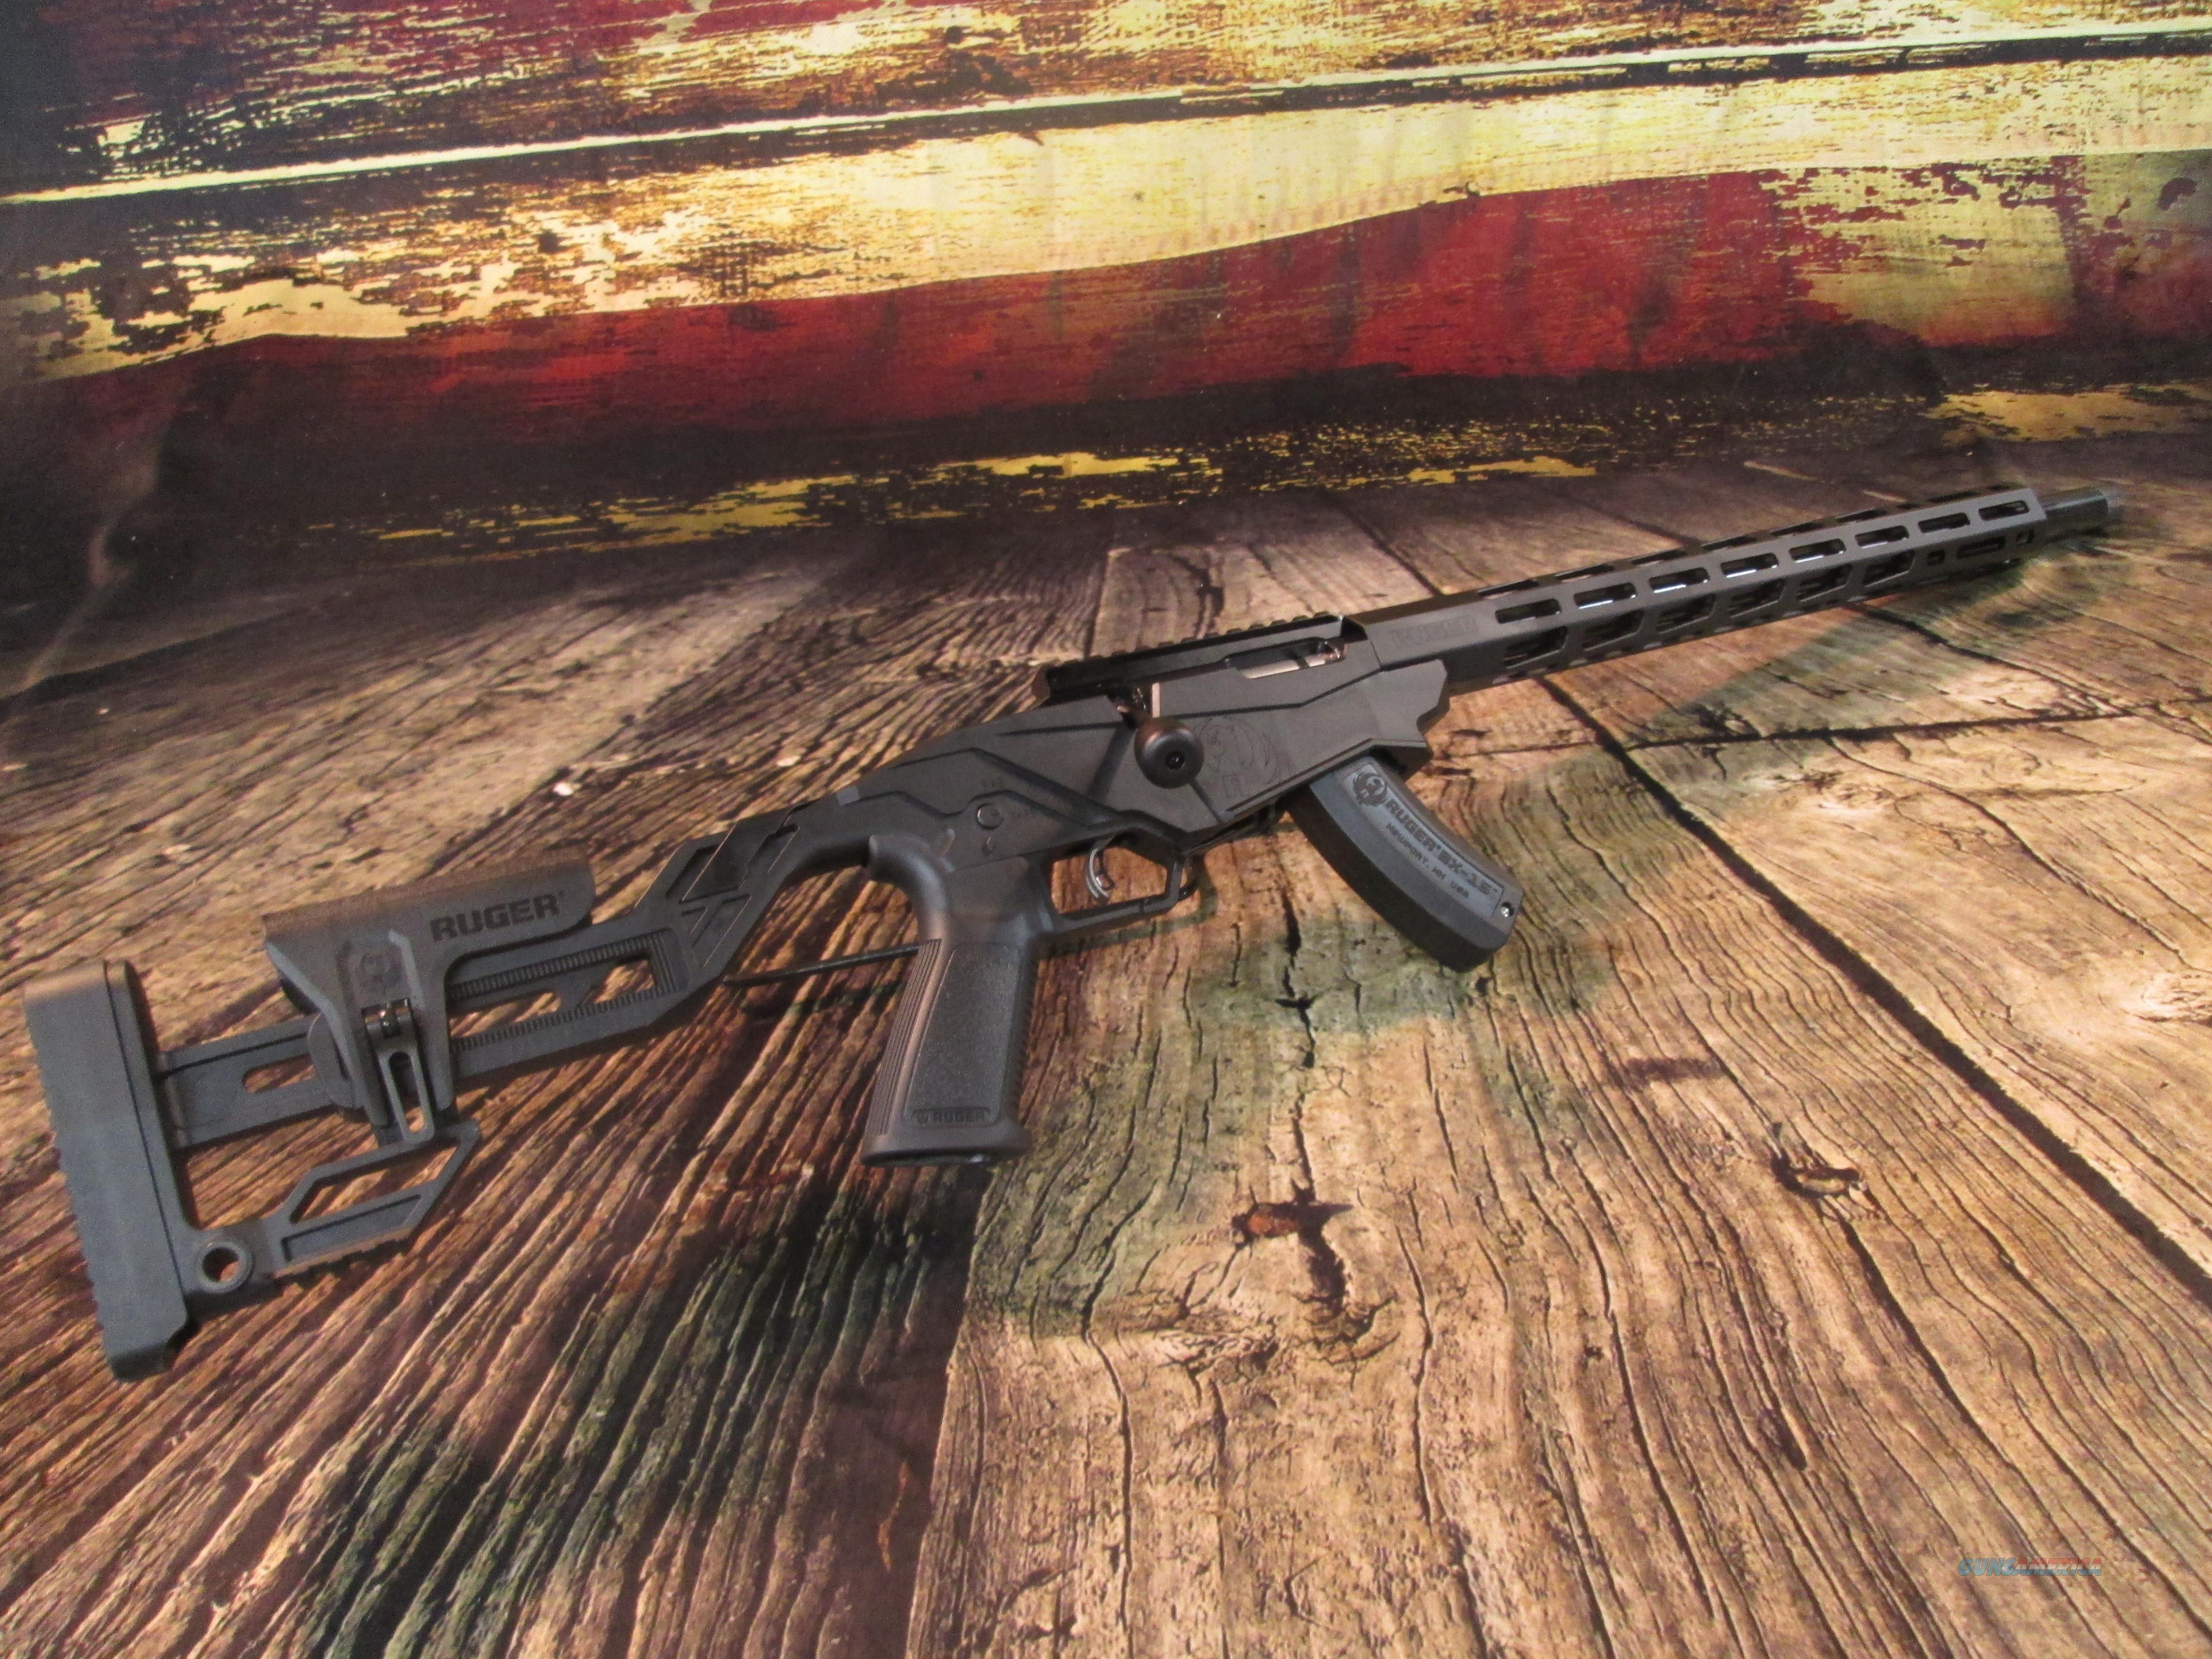 Ruger Precision Rimfire .22 LR New (08400)  Guns > Rifles > Ruger Rifles > Precision Rifle Series